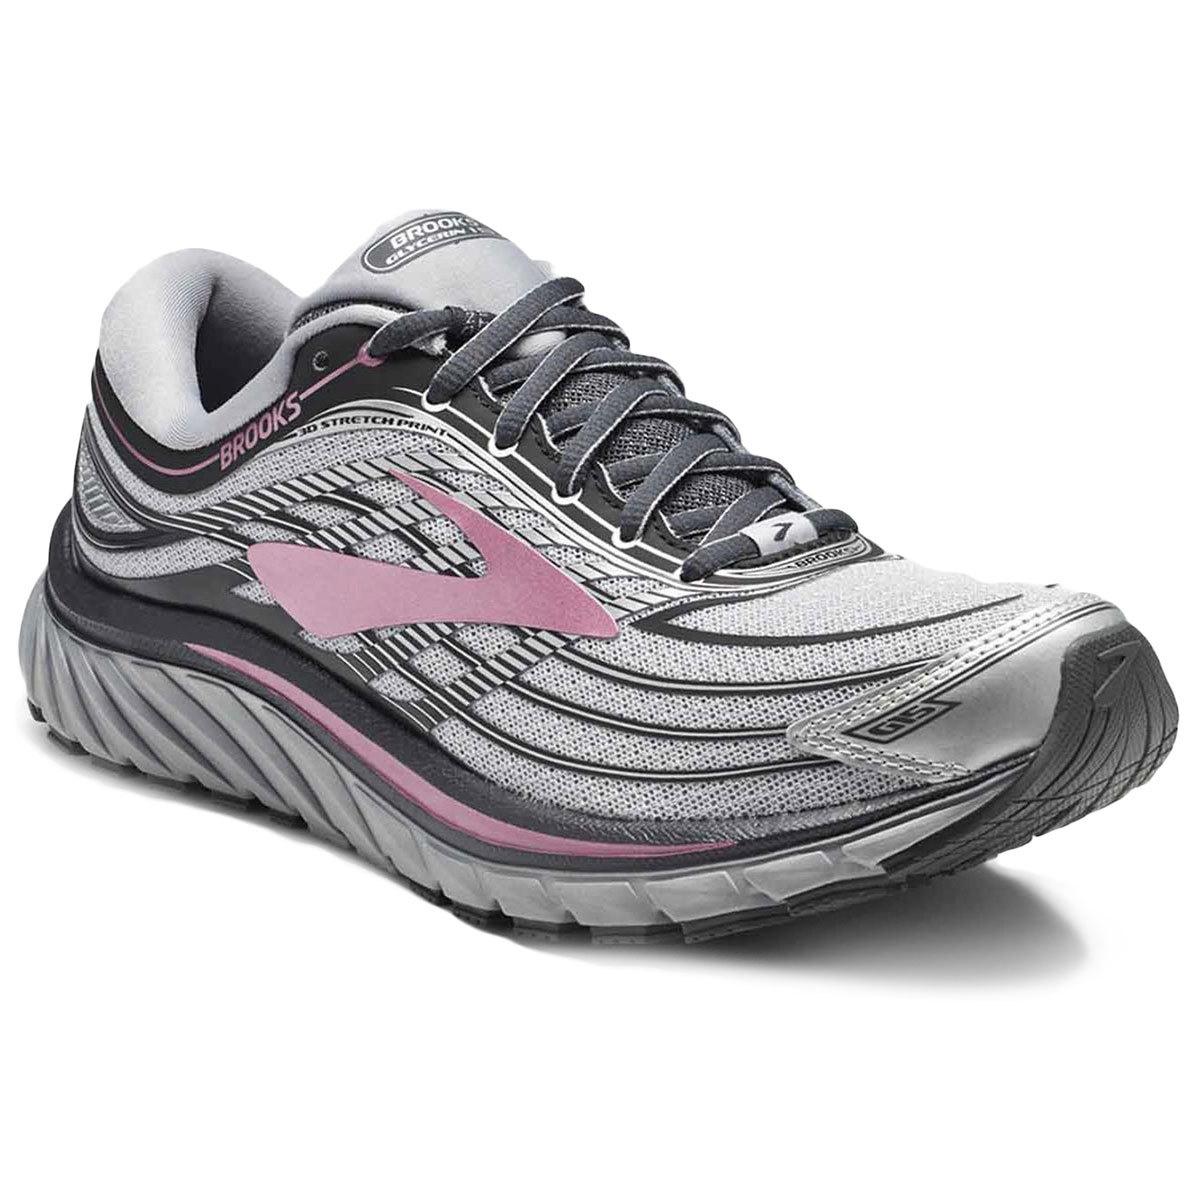 b3abfd86e91 Από την άλλη πλευρά υπάρχουν και τα Brooks Glycerin, ένα σούπερ – μαλακό  παπούτσι που σου δίνει μια πολύ ανάλαφρη αίσθηση σε κάθε σου βήμα.